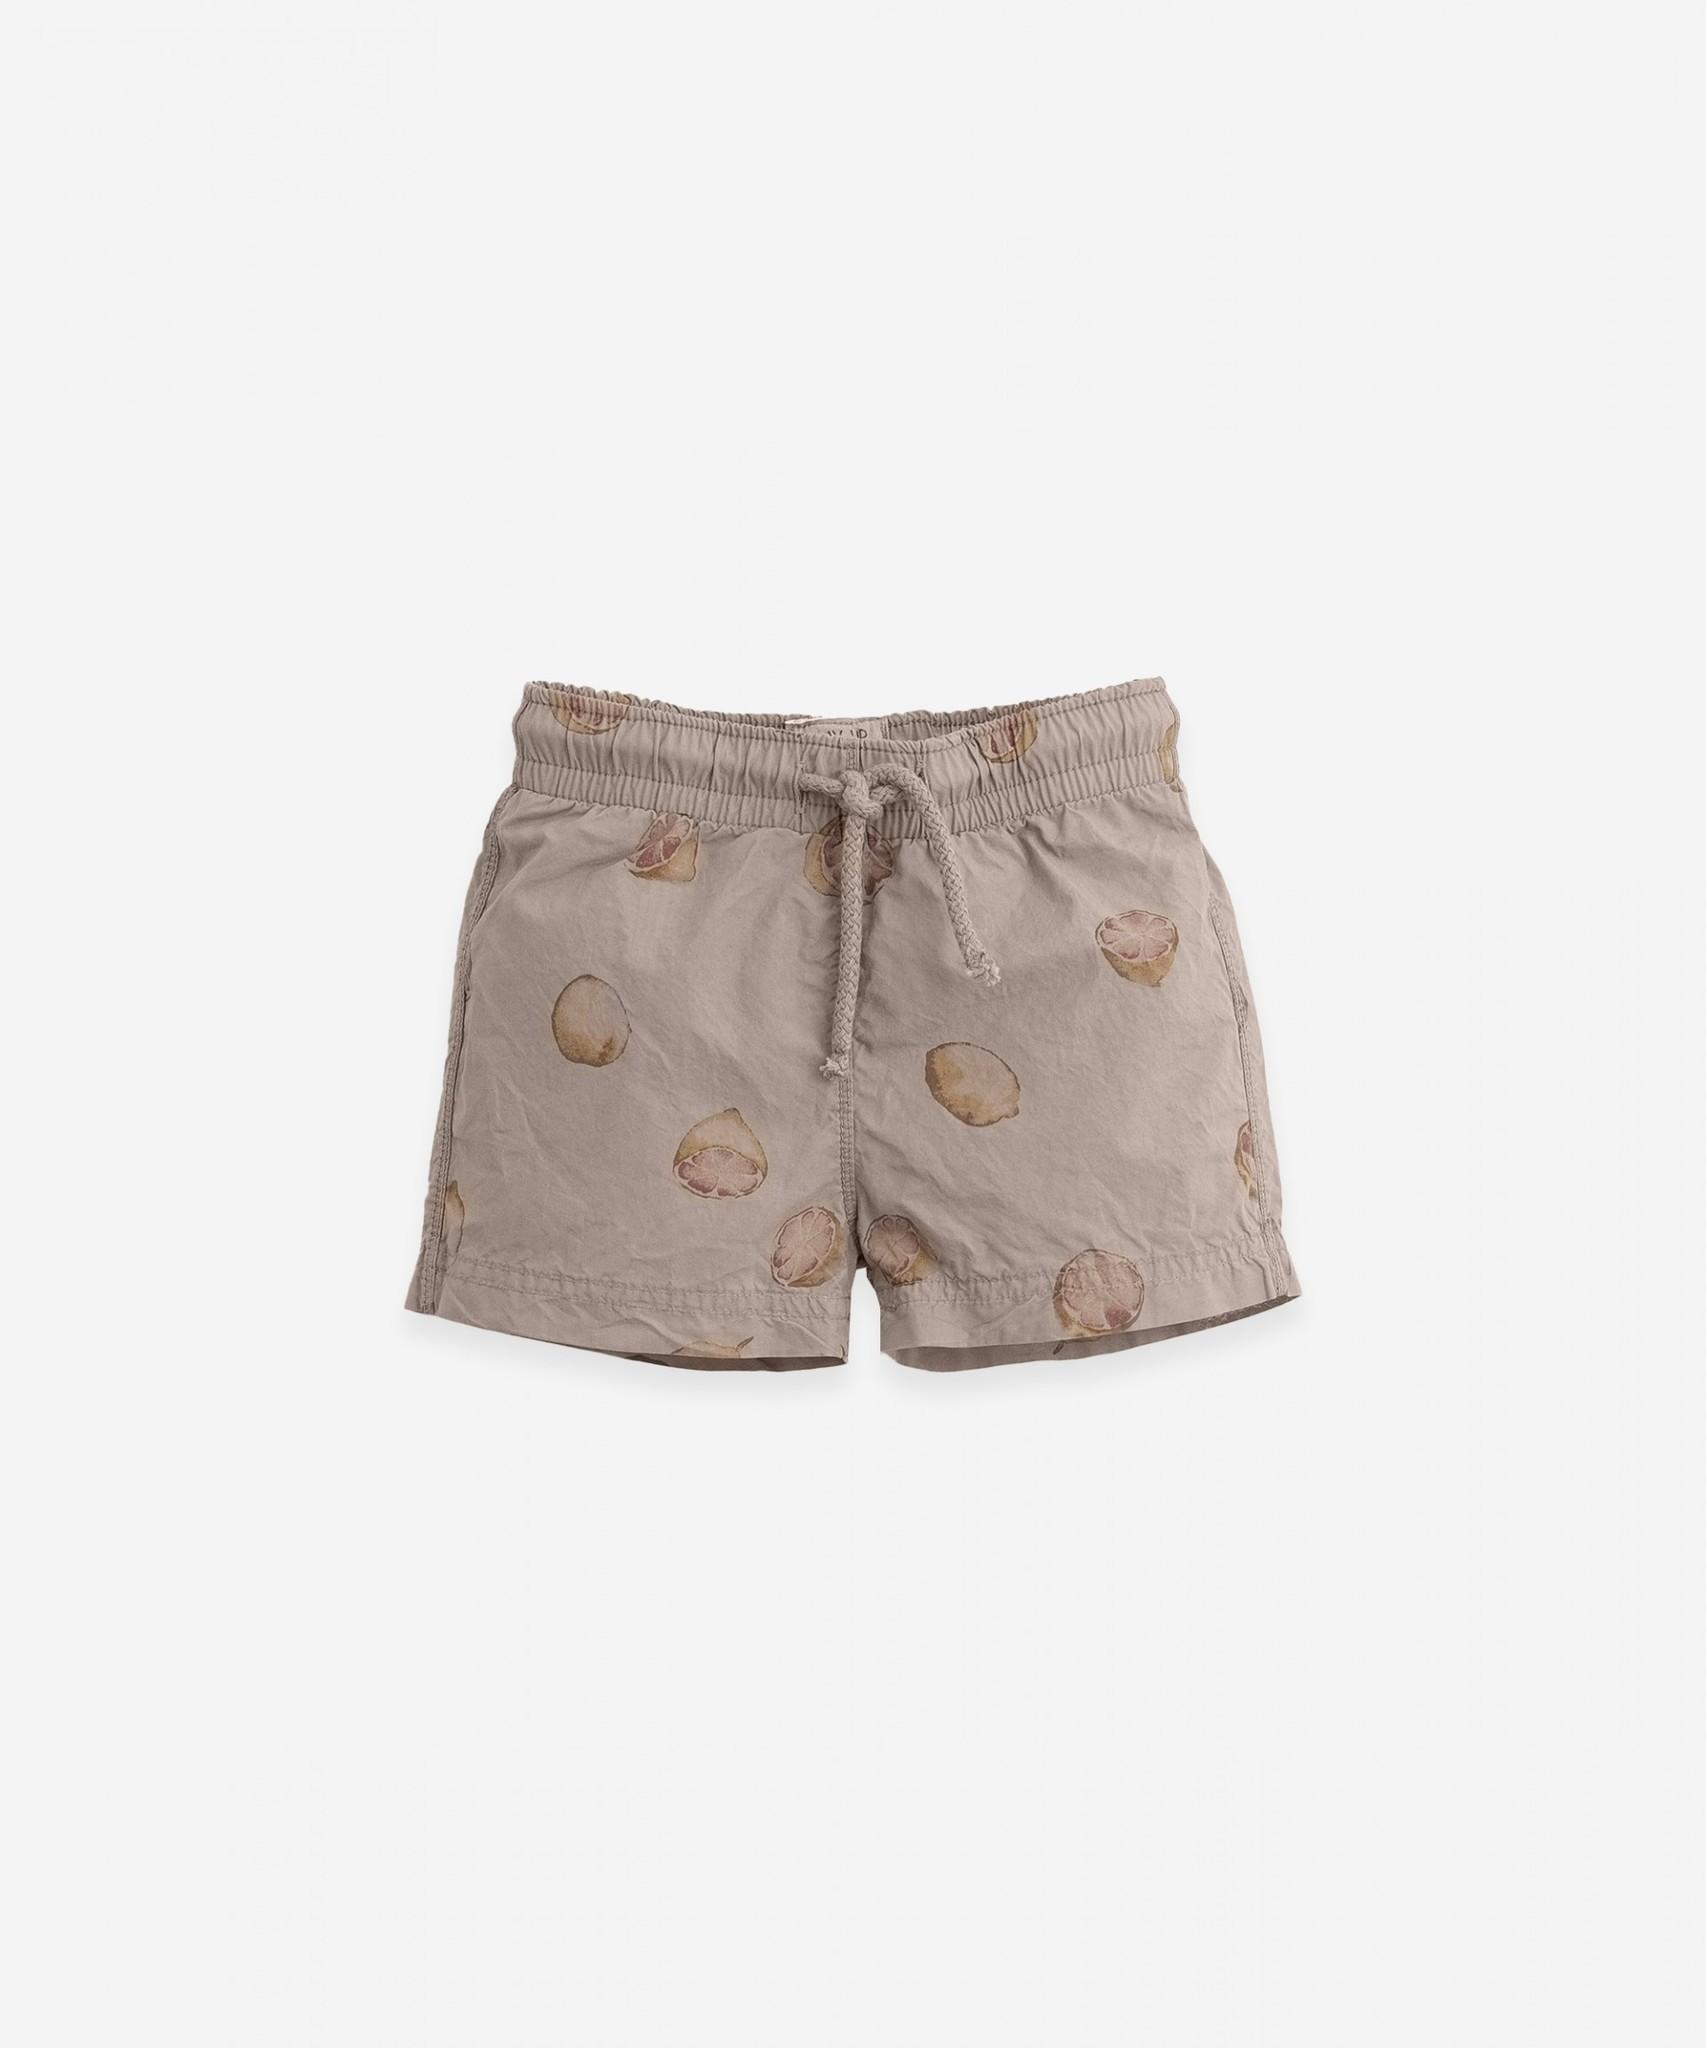 Play-up Printed Poplin swim shorts | Bicho